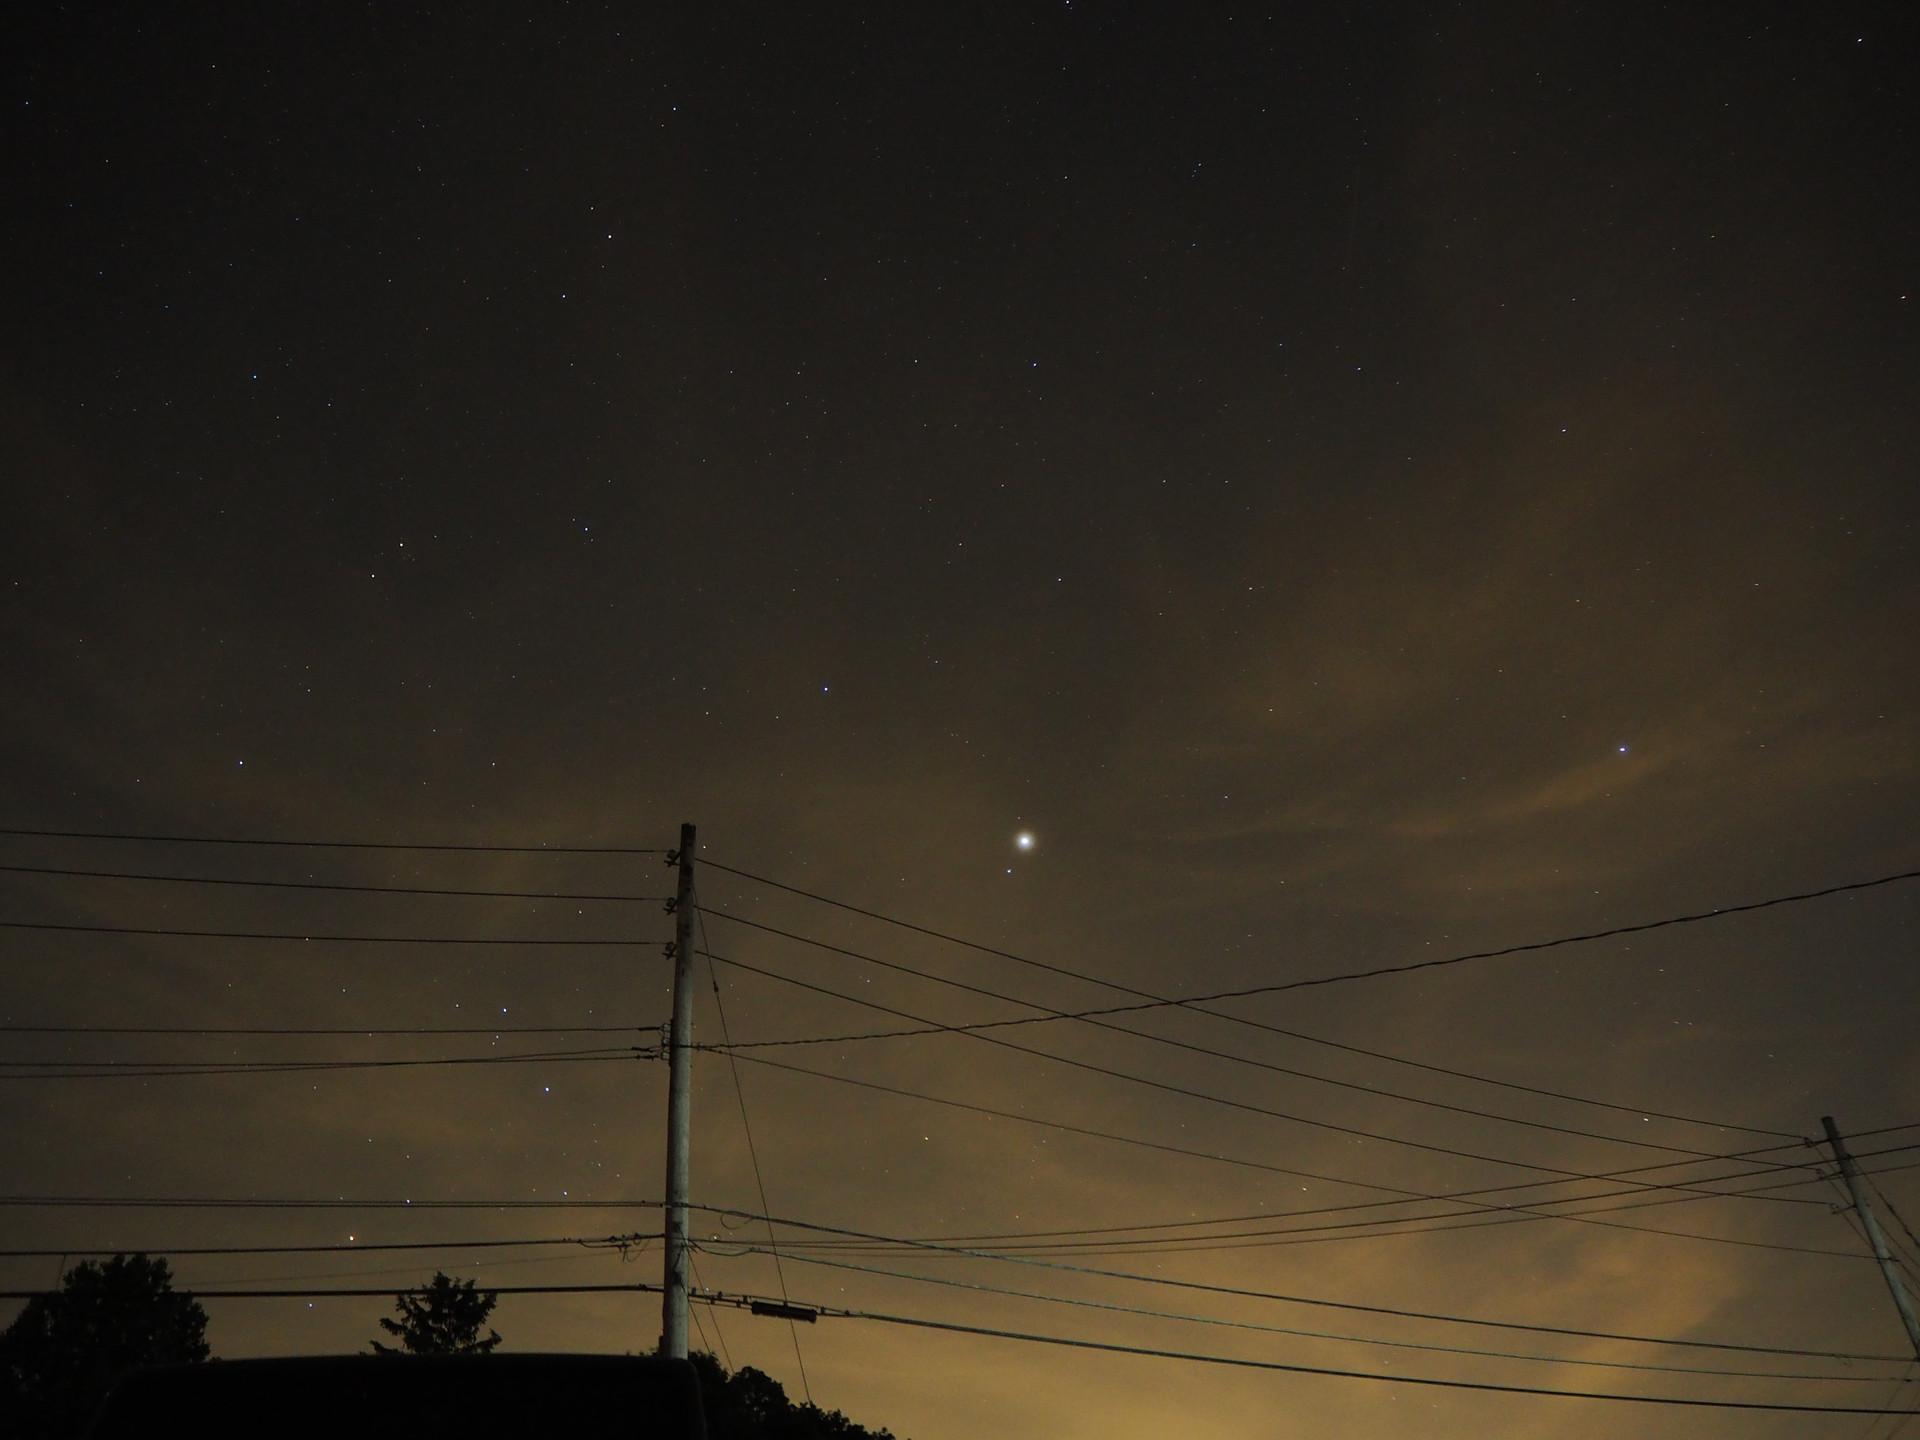 Venus making an appearance